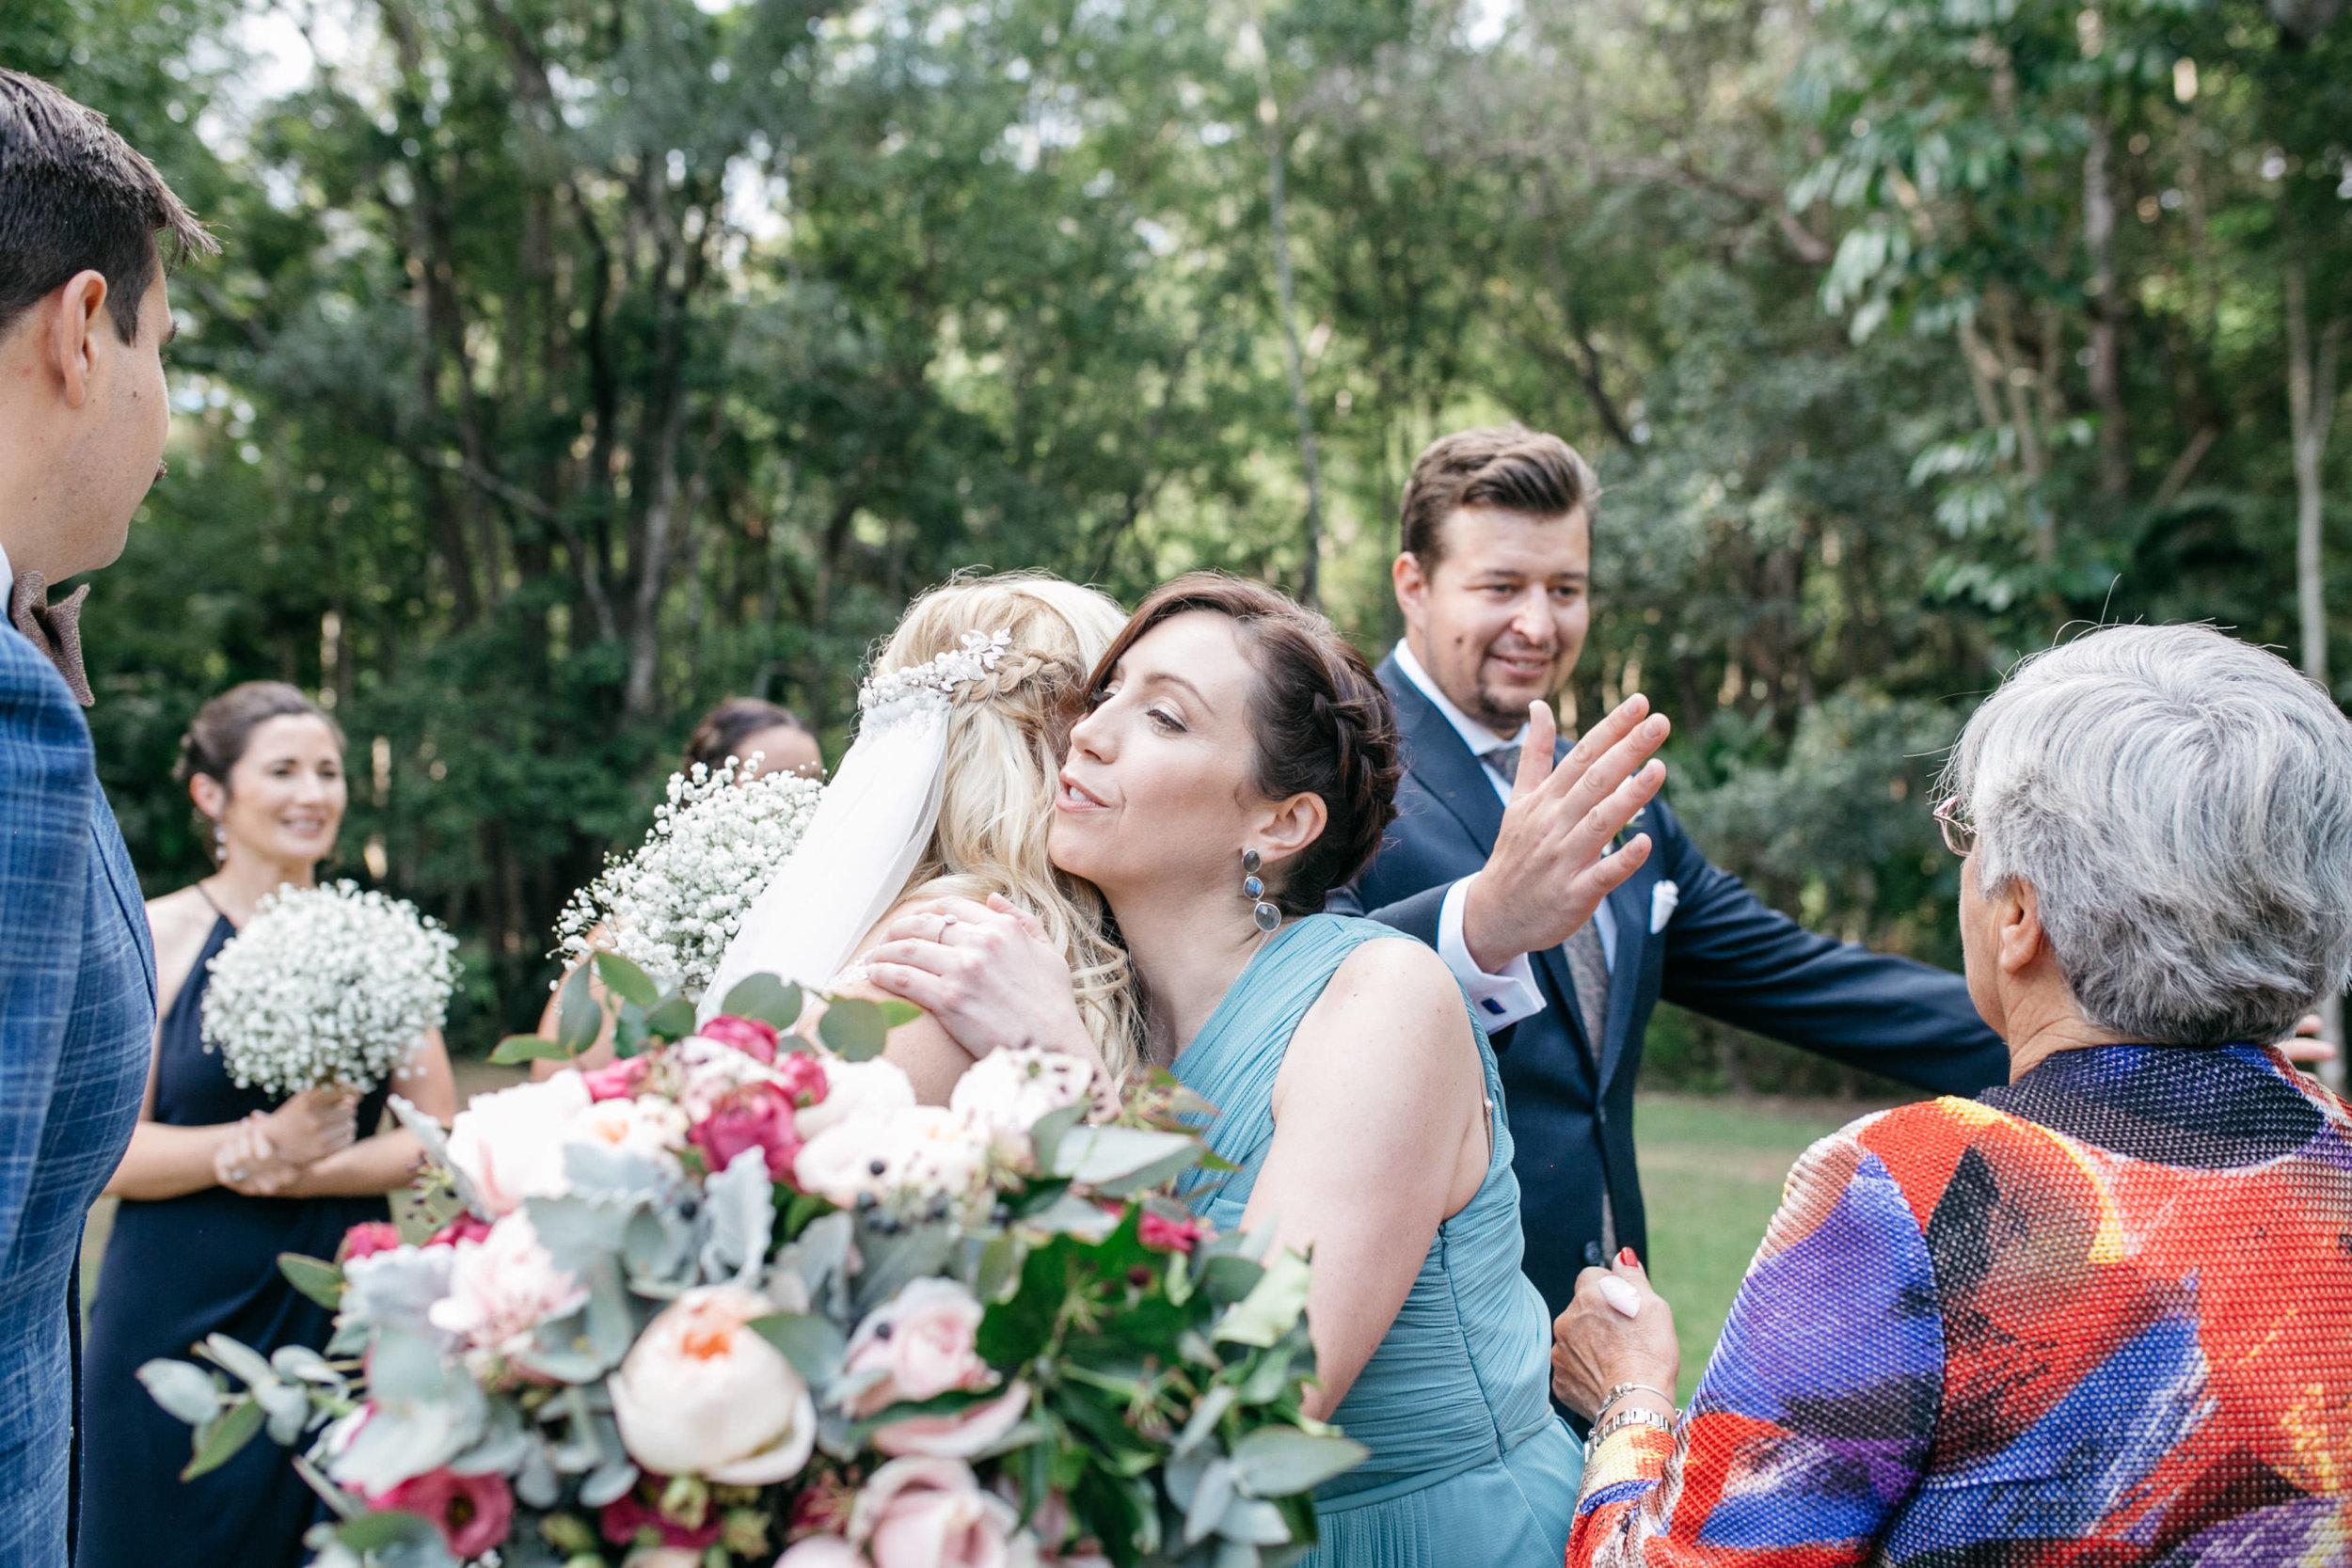 True North Photography_Boomerang Farm_Stacey and Isaac_Gold Coast Wedding_Barm Wedding_Hinterland Wedding-116.jpg